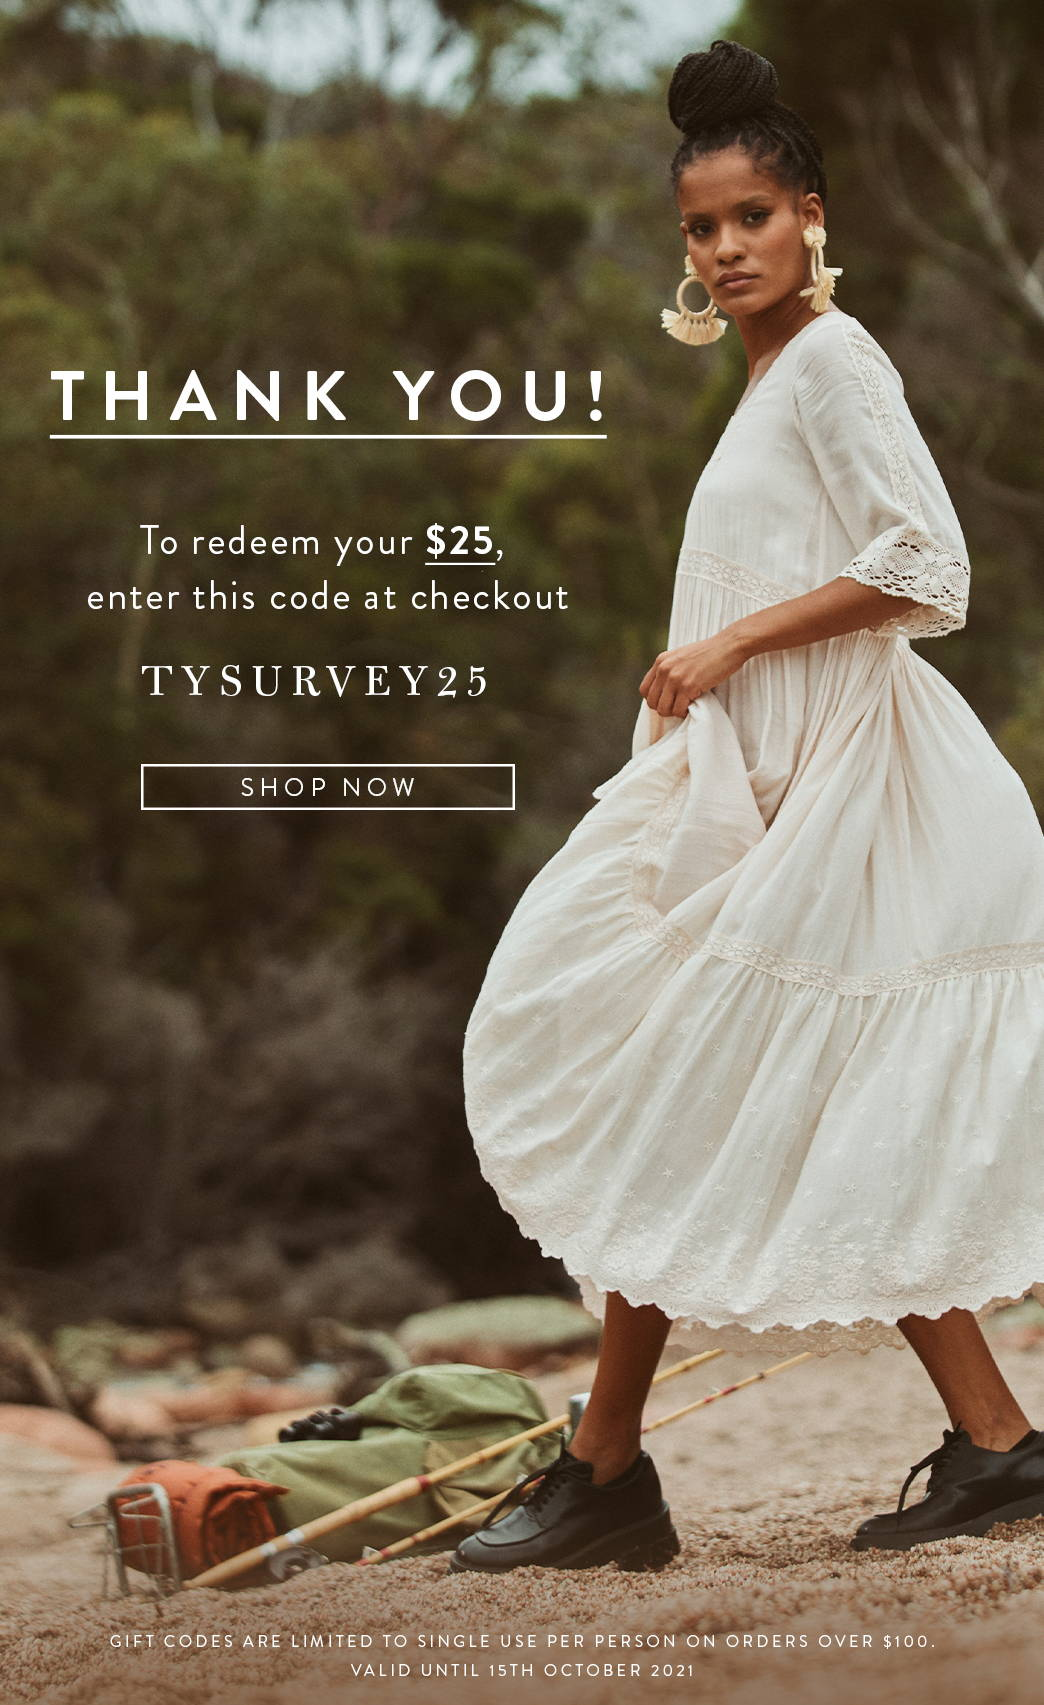 Thank You Survey Code TYSURVEY25